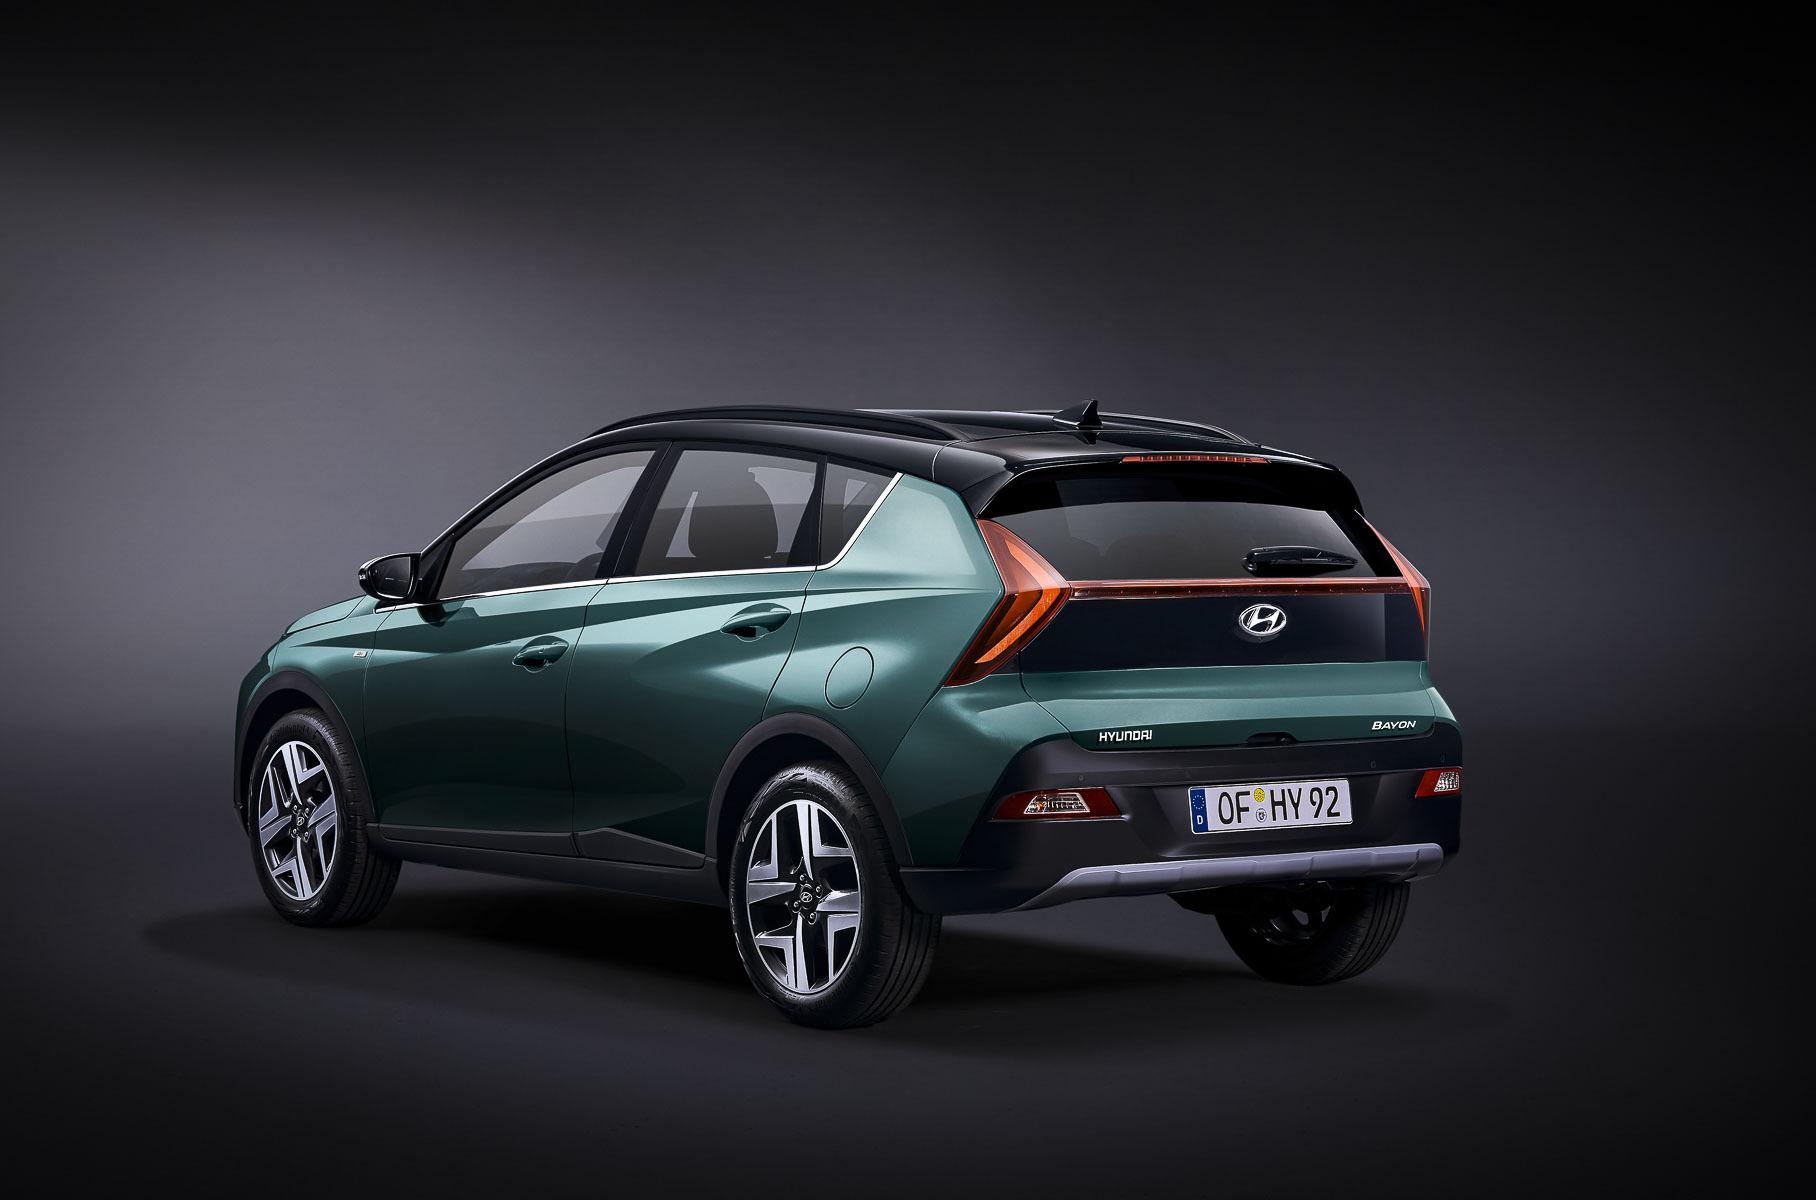 Hyundai представила маленький кроссовер Bayon